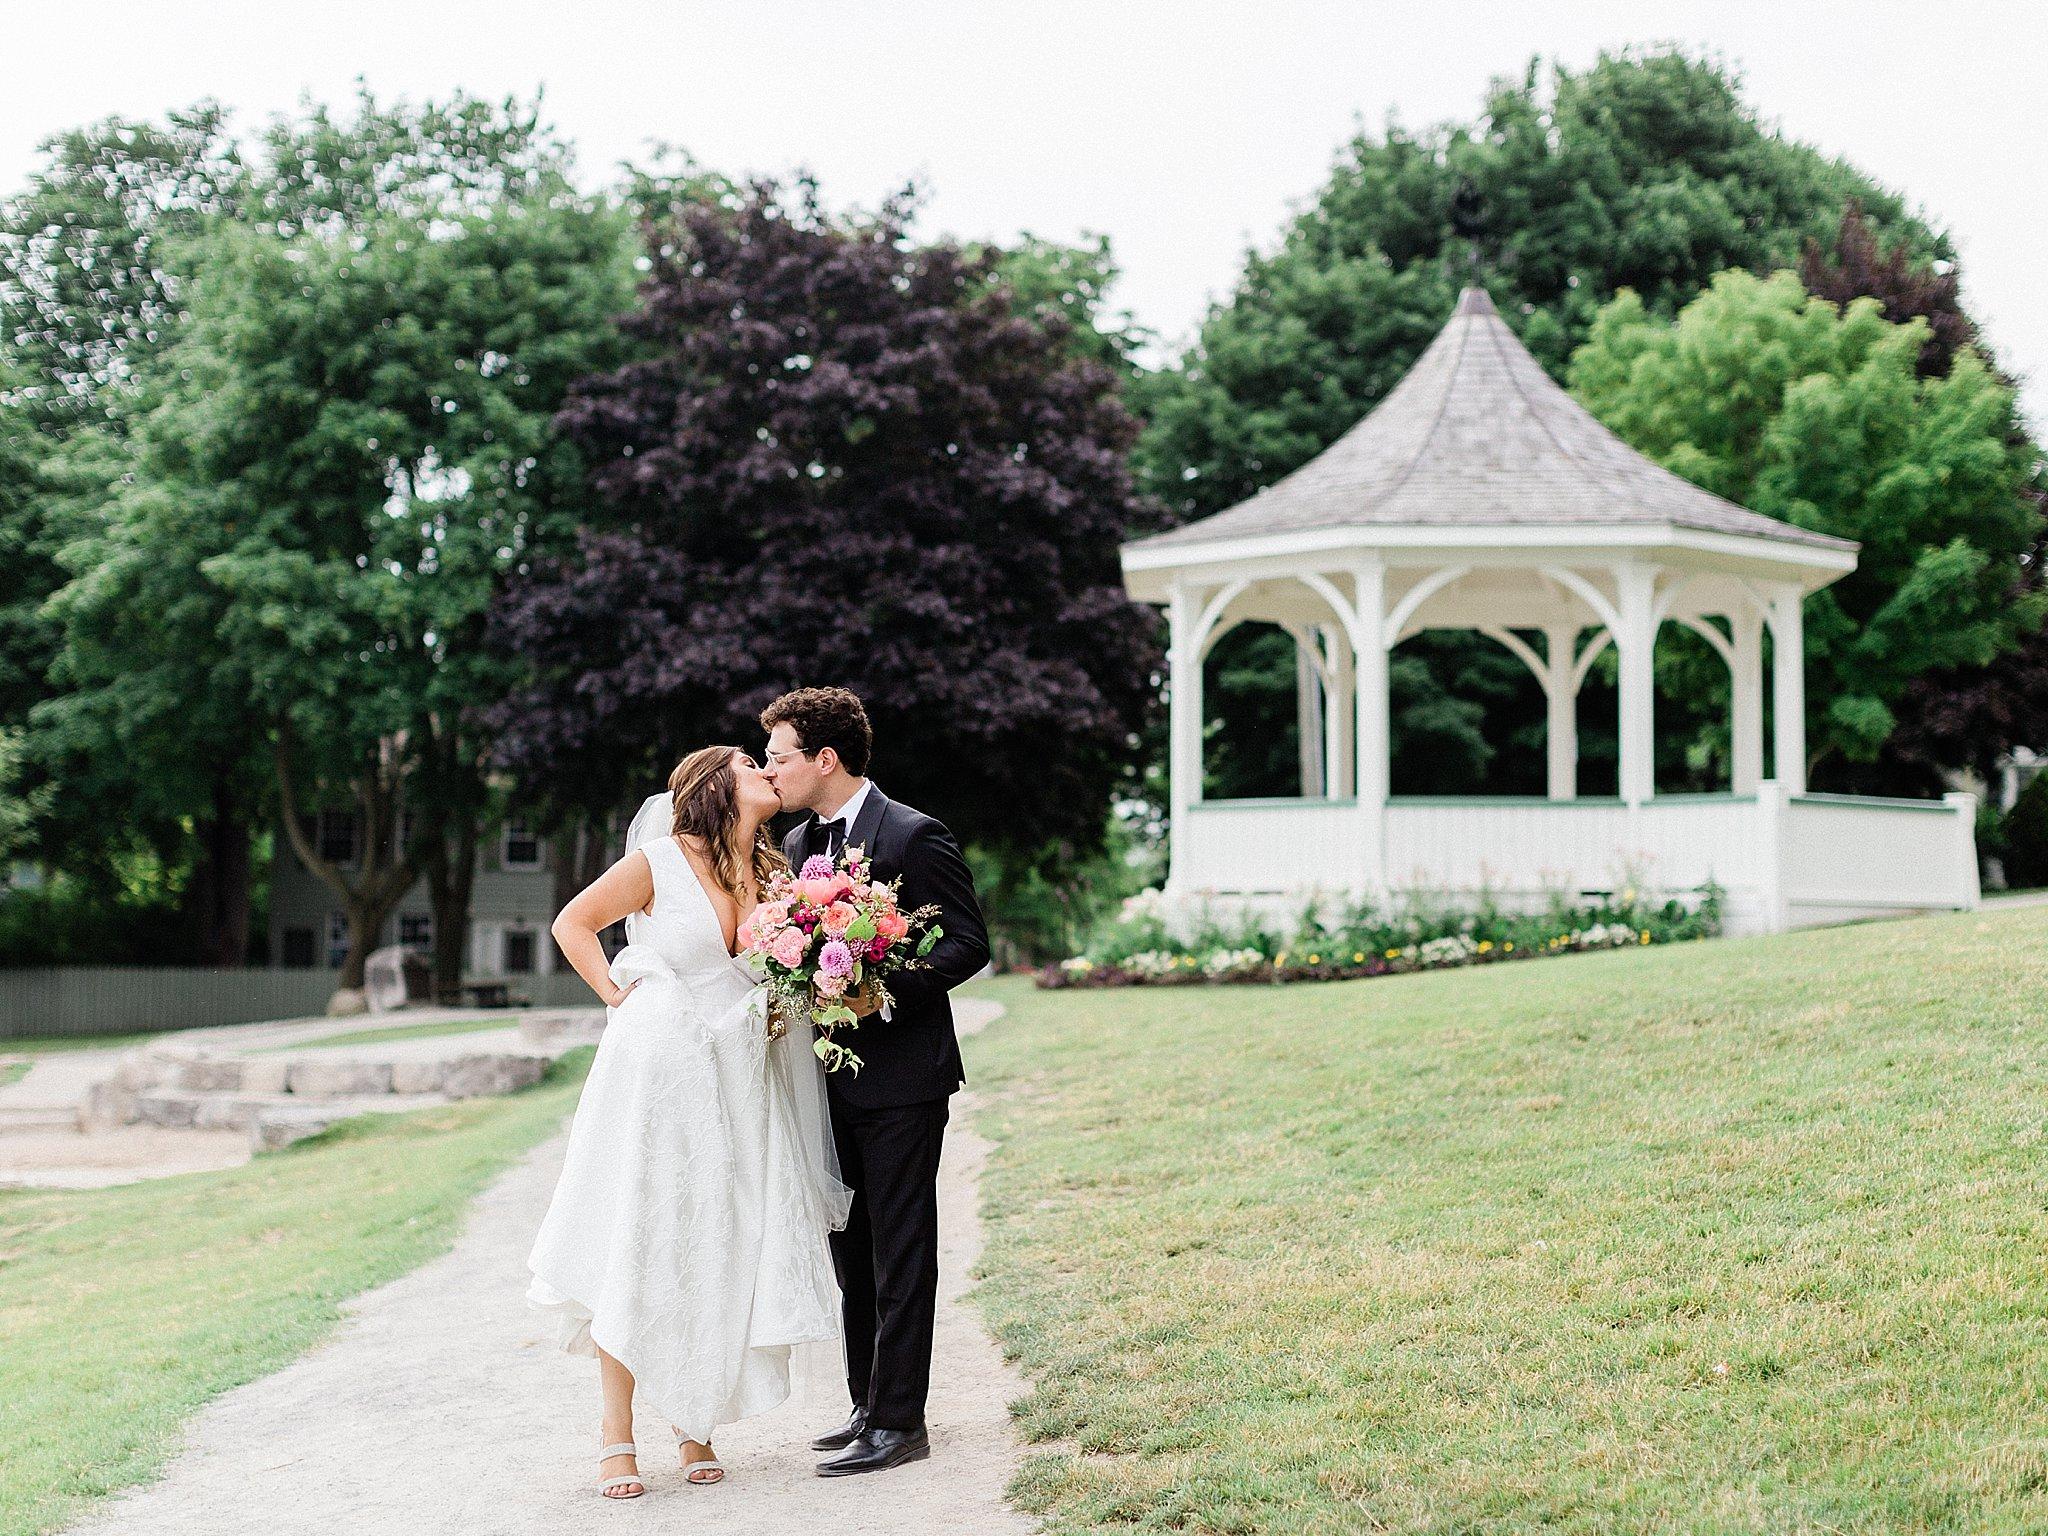 Toronto Wedding Photographer, Durham Region Wedding Photography